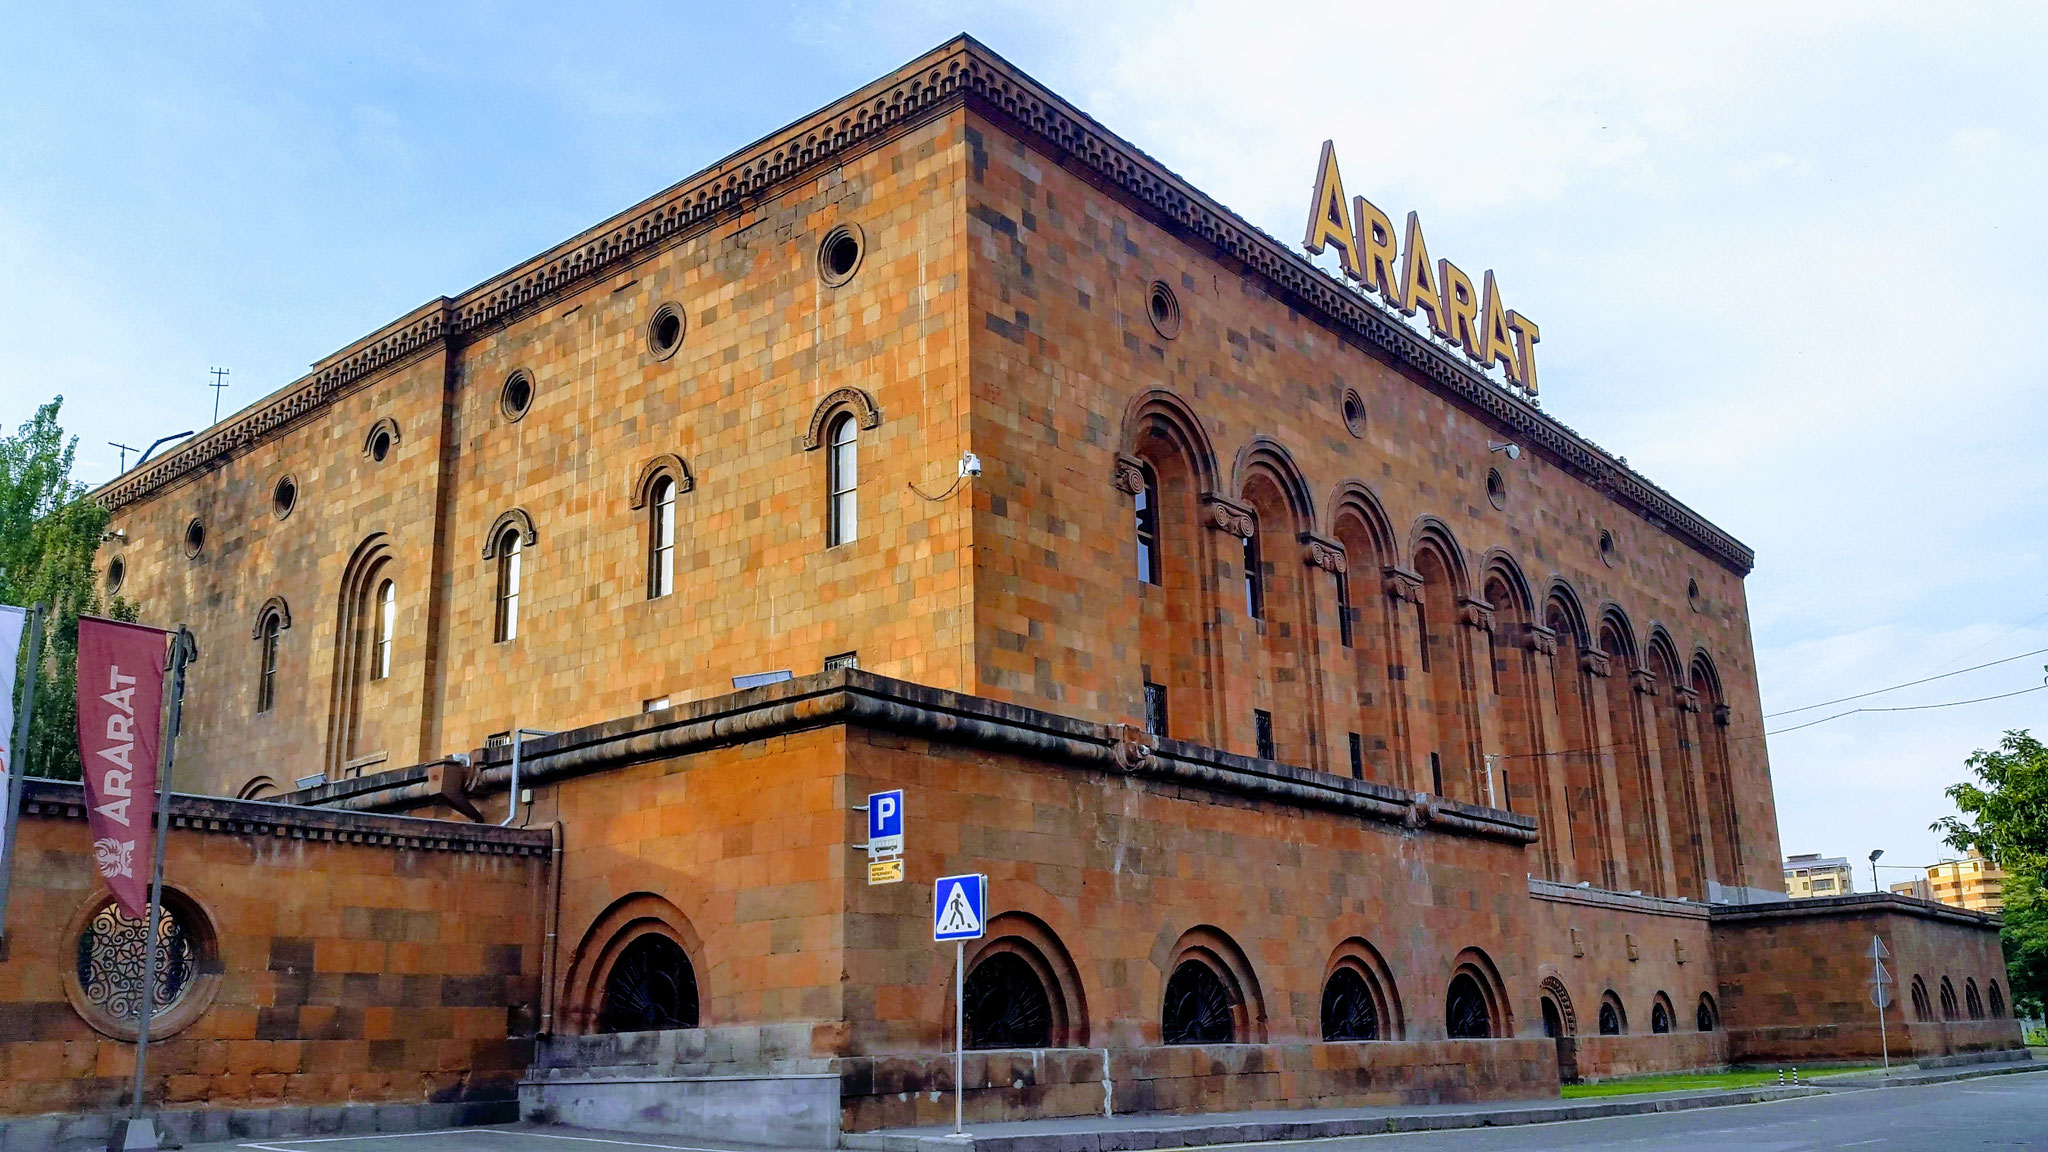 Ararat Brandy Fabrik